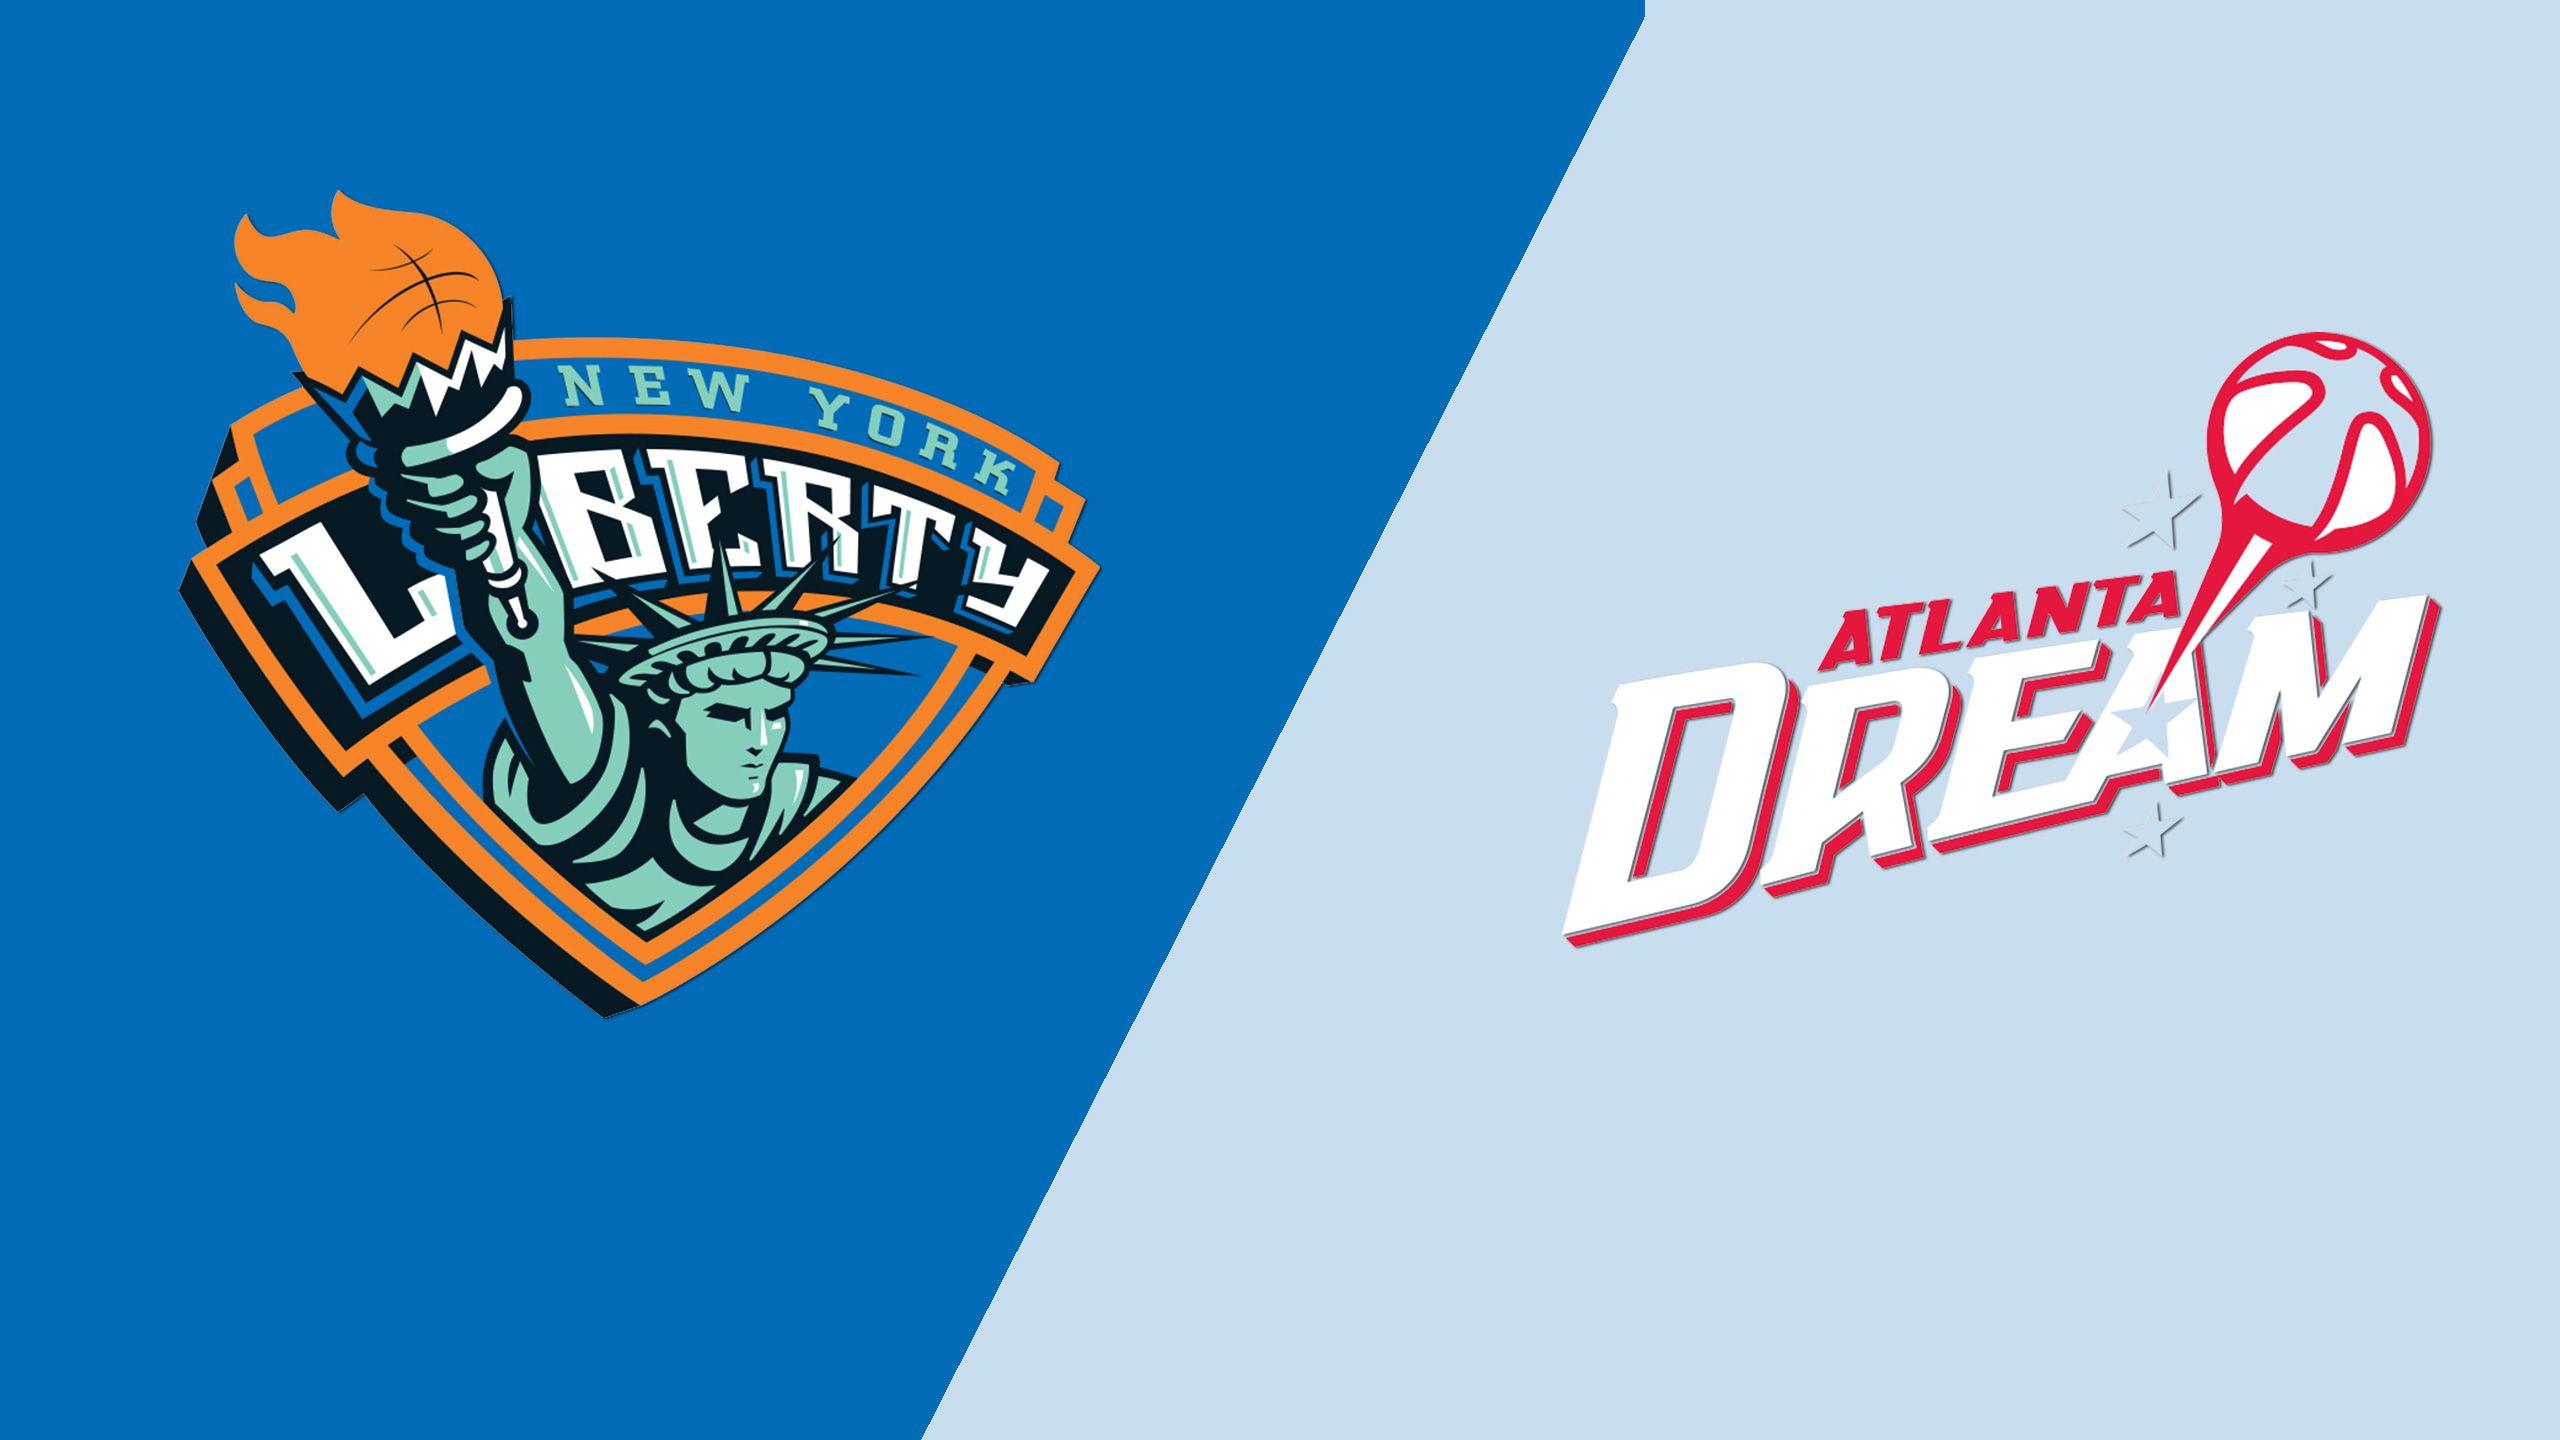 New York Liberty vs. Atlanta Dream